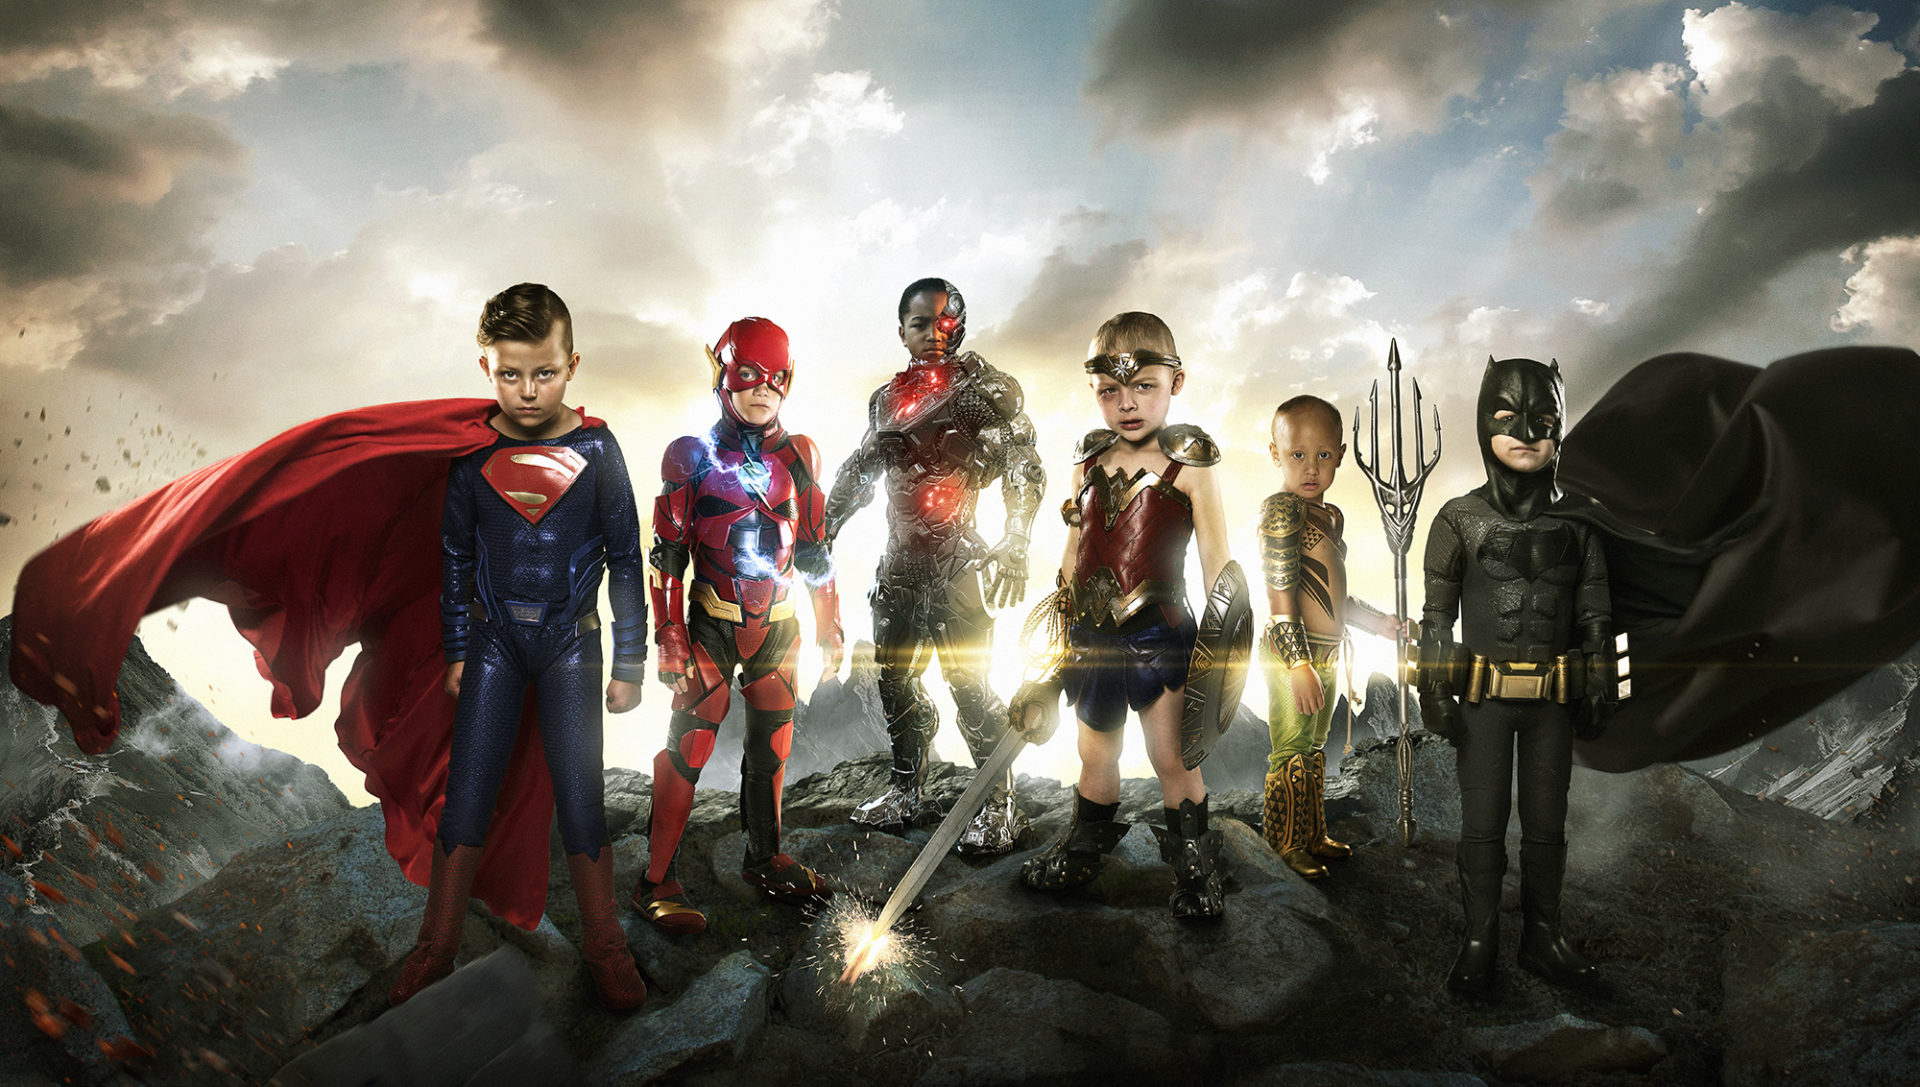 The REAL Justice League! ช่างภาพอเมริกันถ่ายภาพ 'นักสู้ตัวจิ๋ว' เป็นเหล่าฮีโร่สร้างพลังบวก